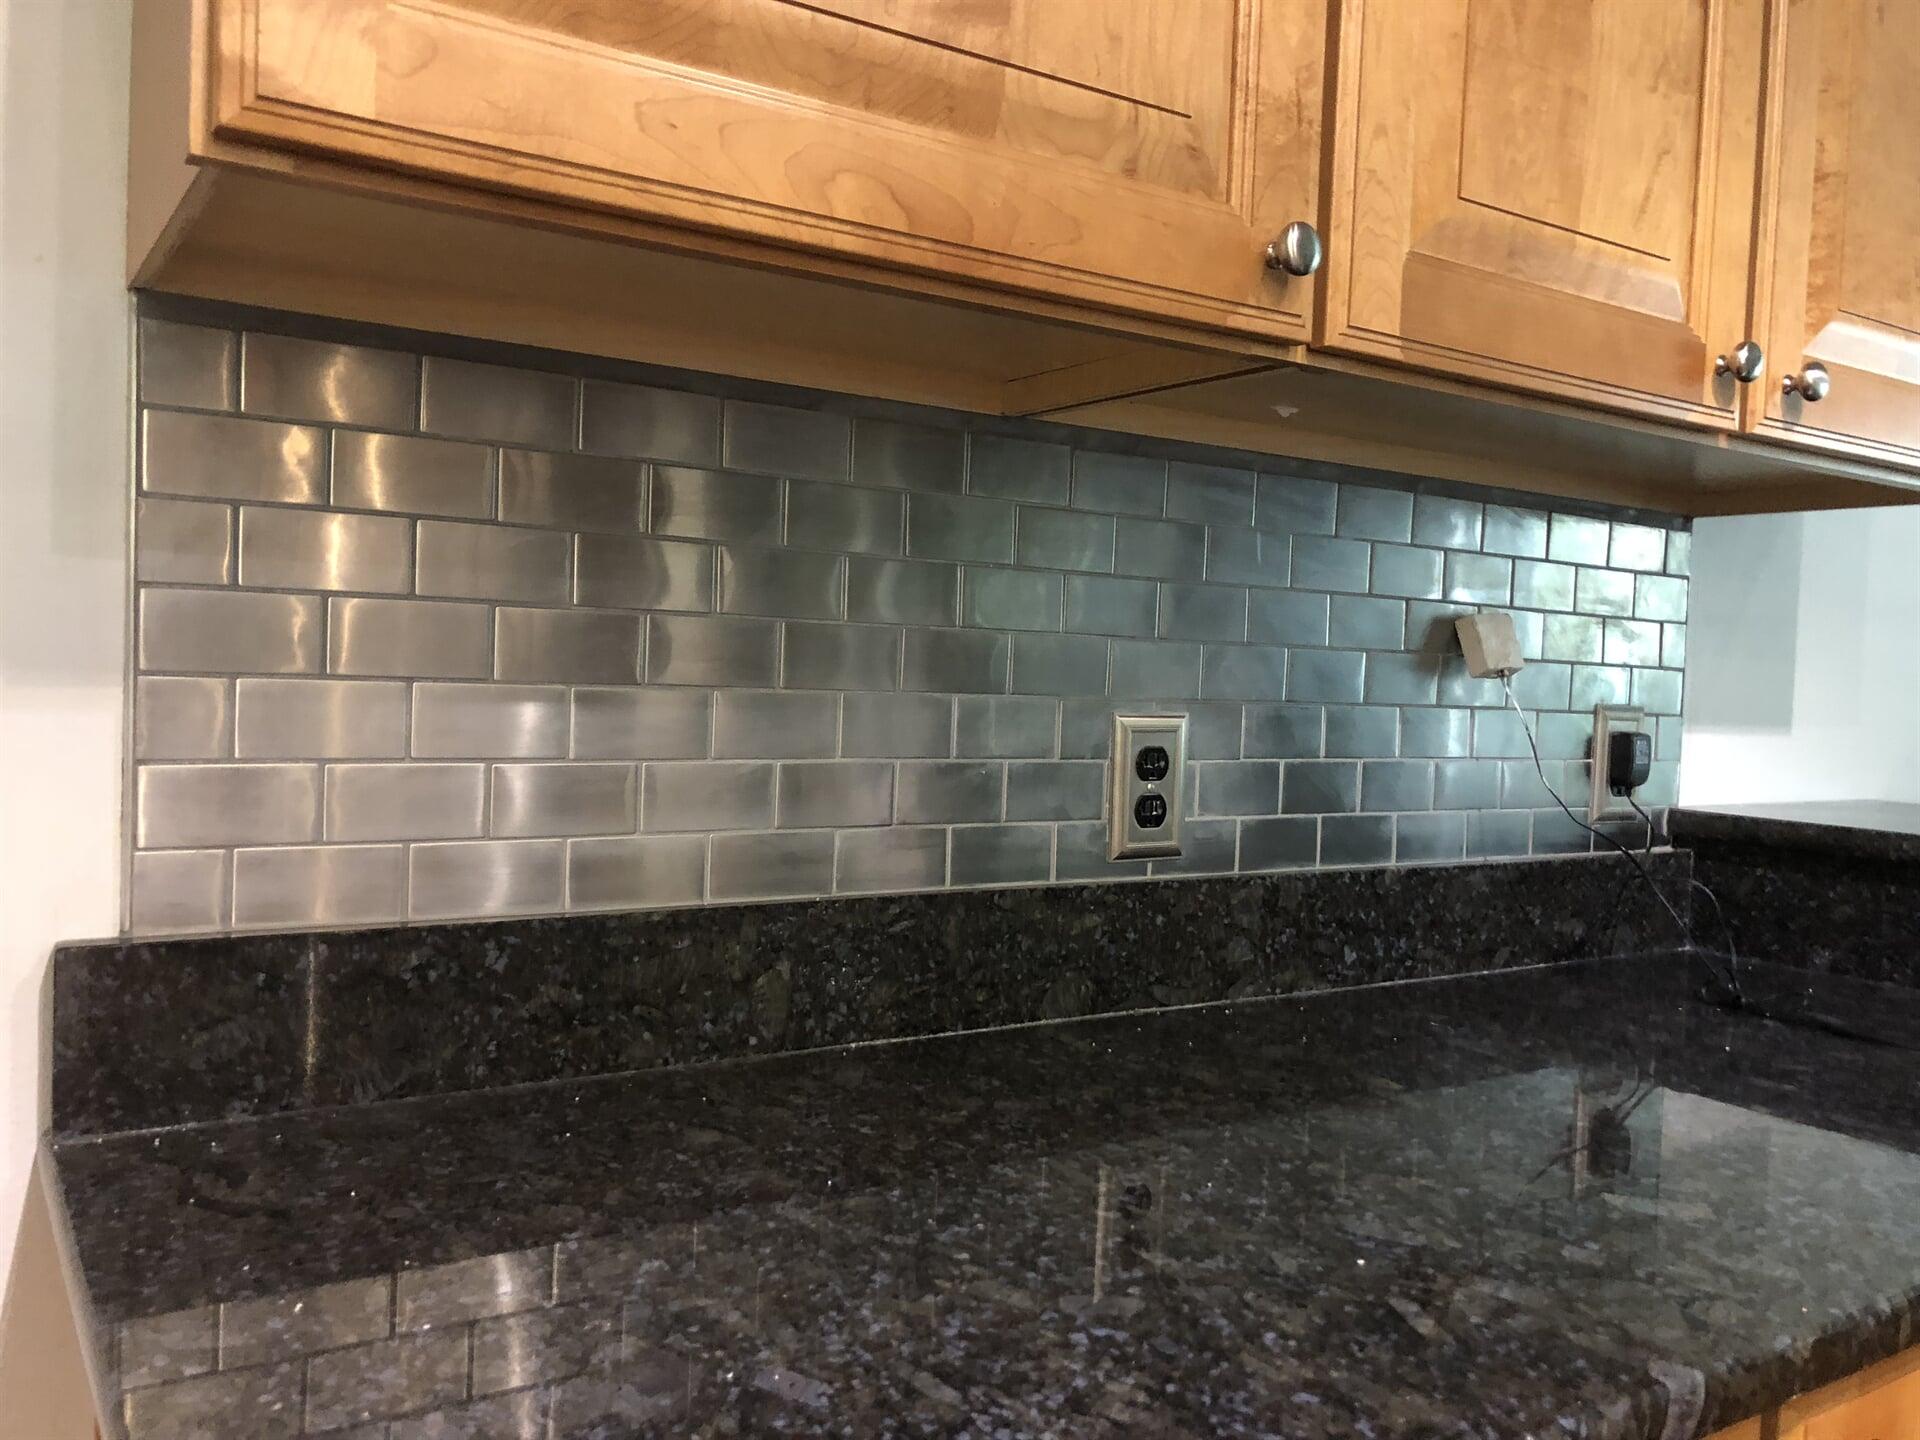 Tile backsplash from Emerald Installation in Poulsbo, WA